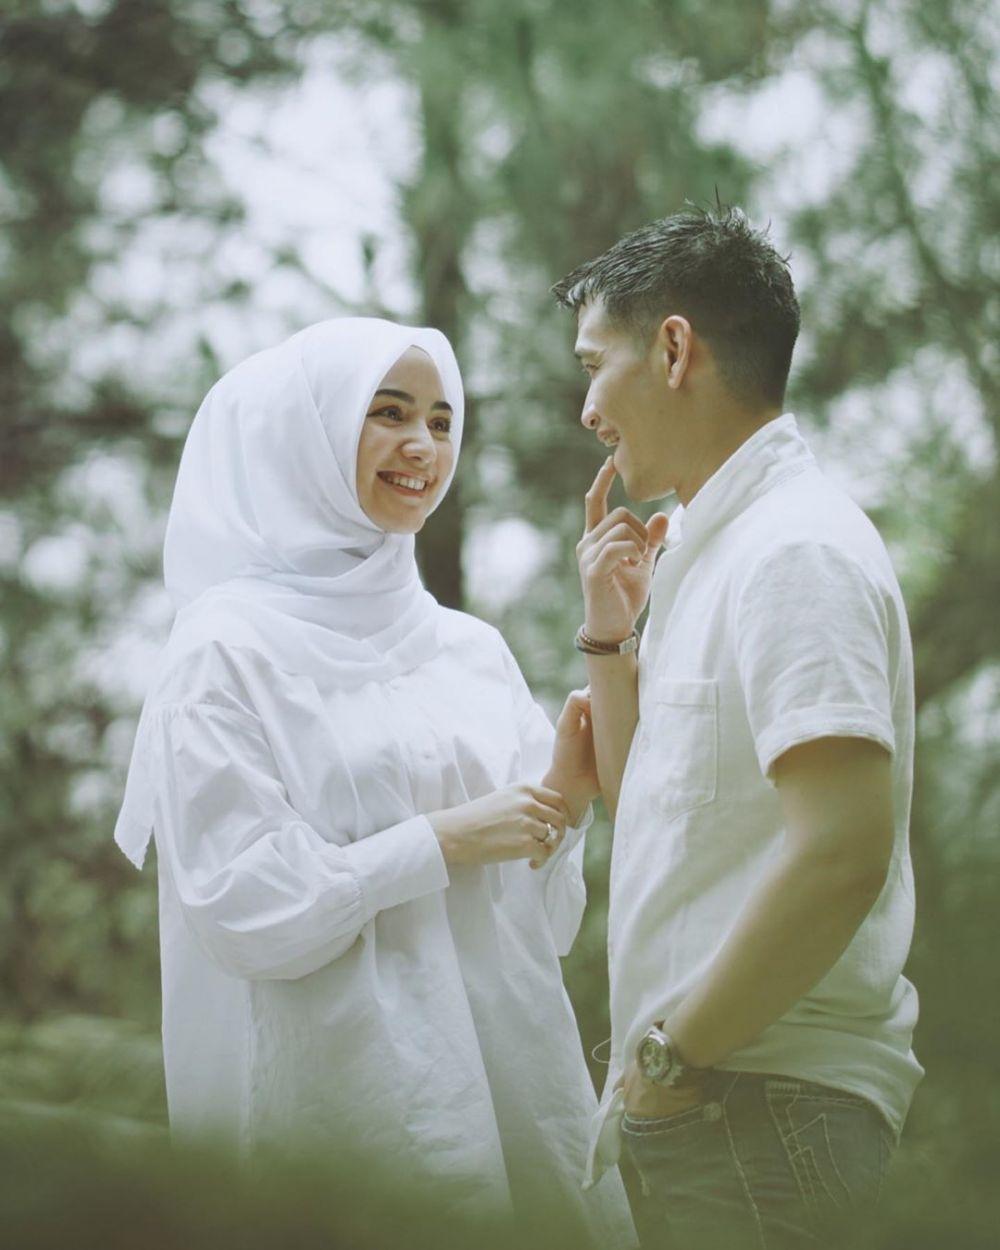 gaya prewedding citra kirana rezky aditya berbagai tema © 2019 instagram.com